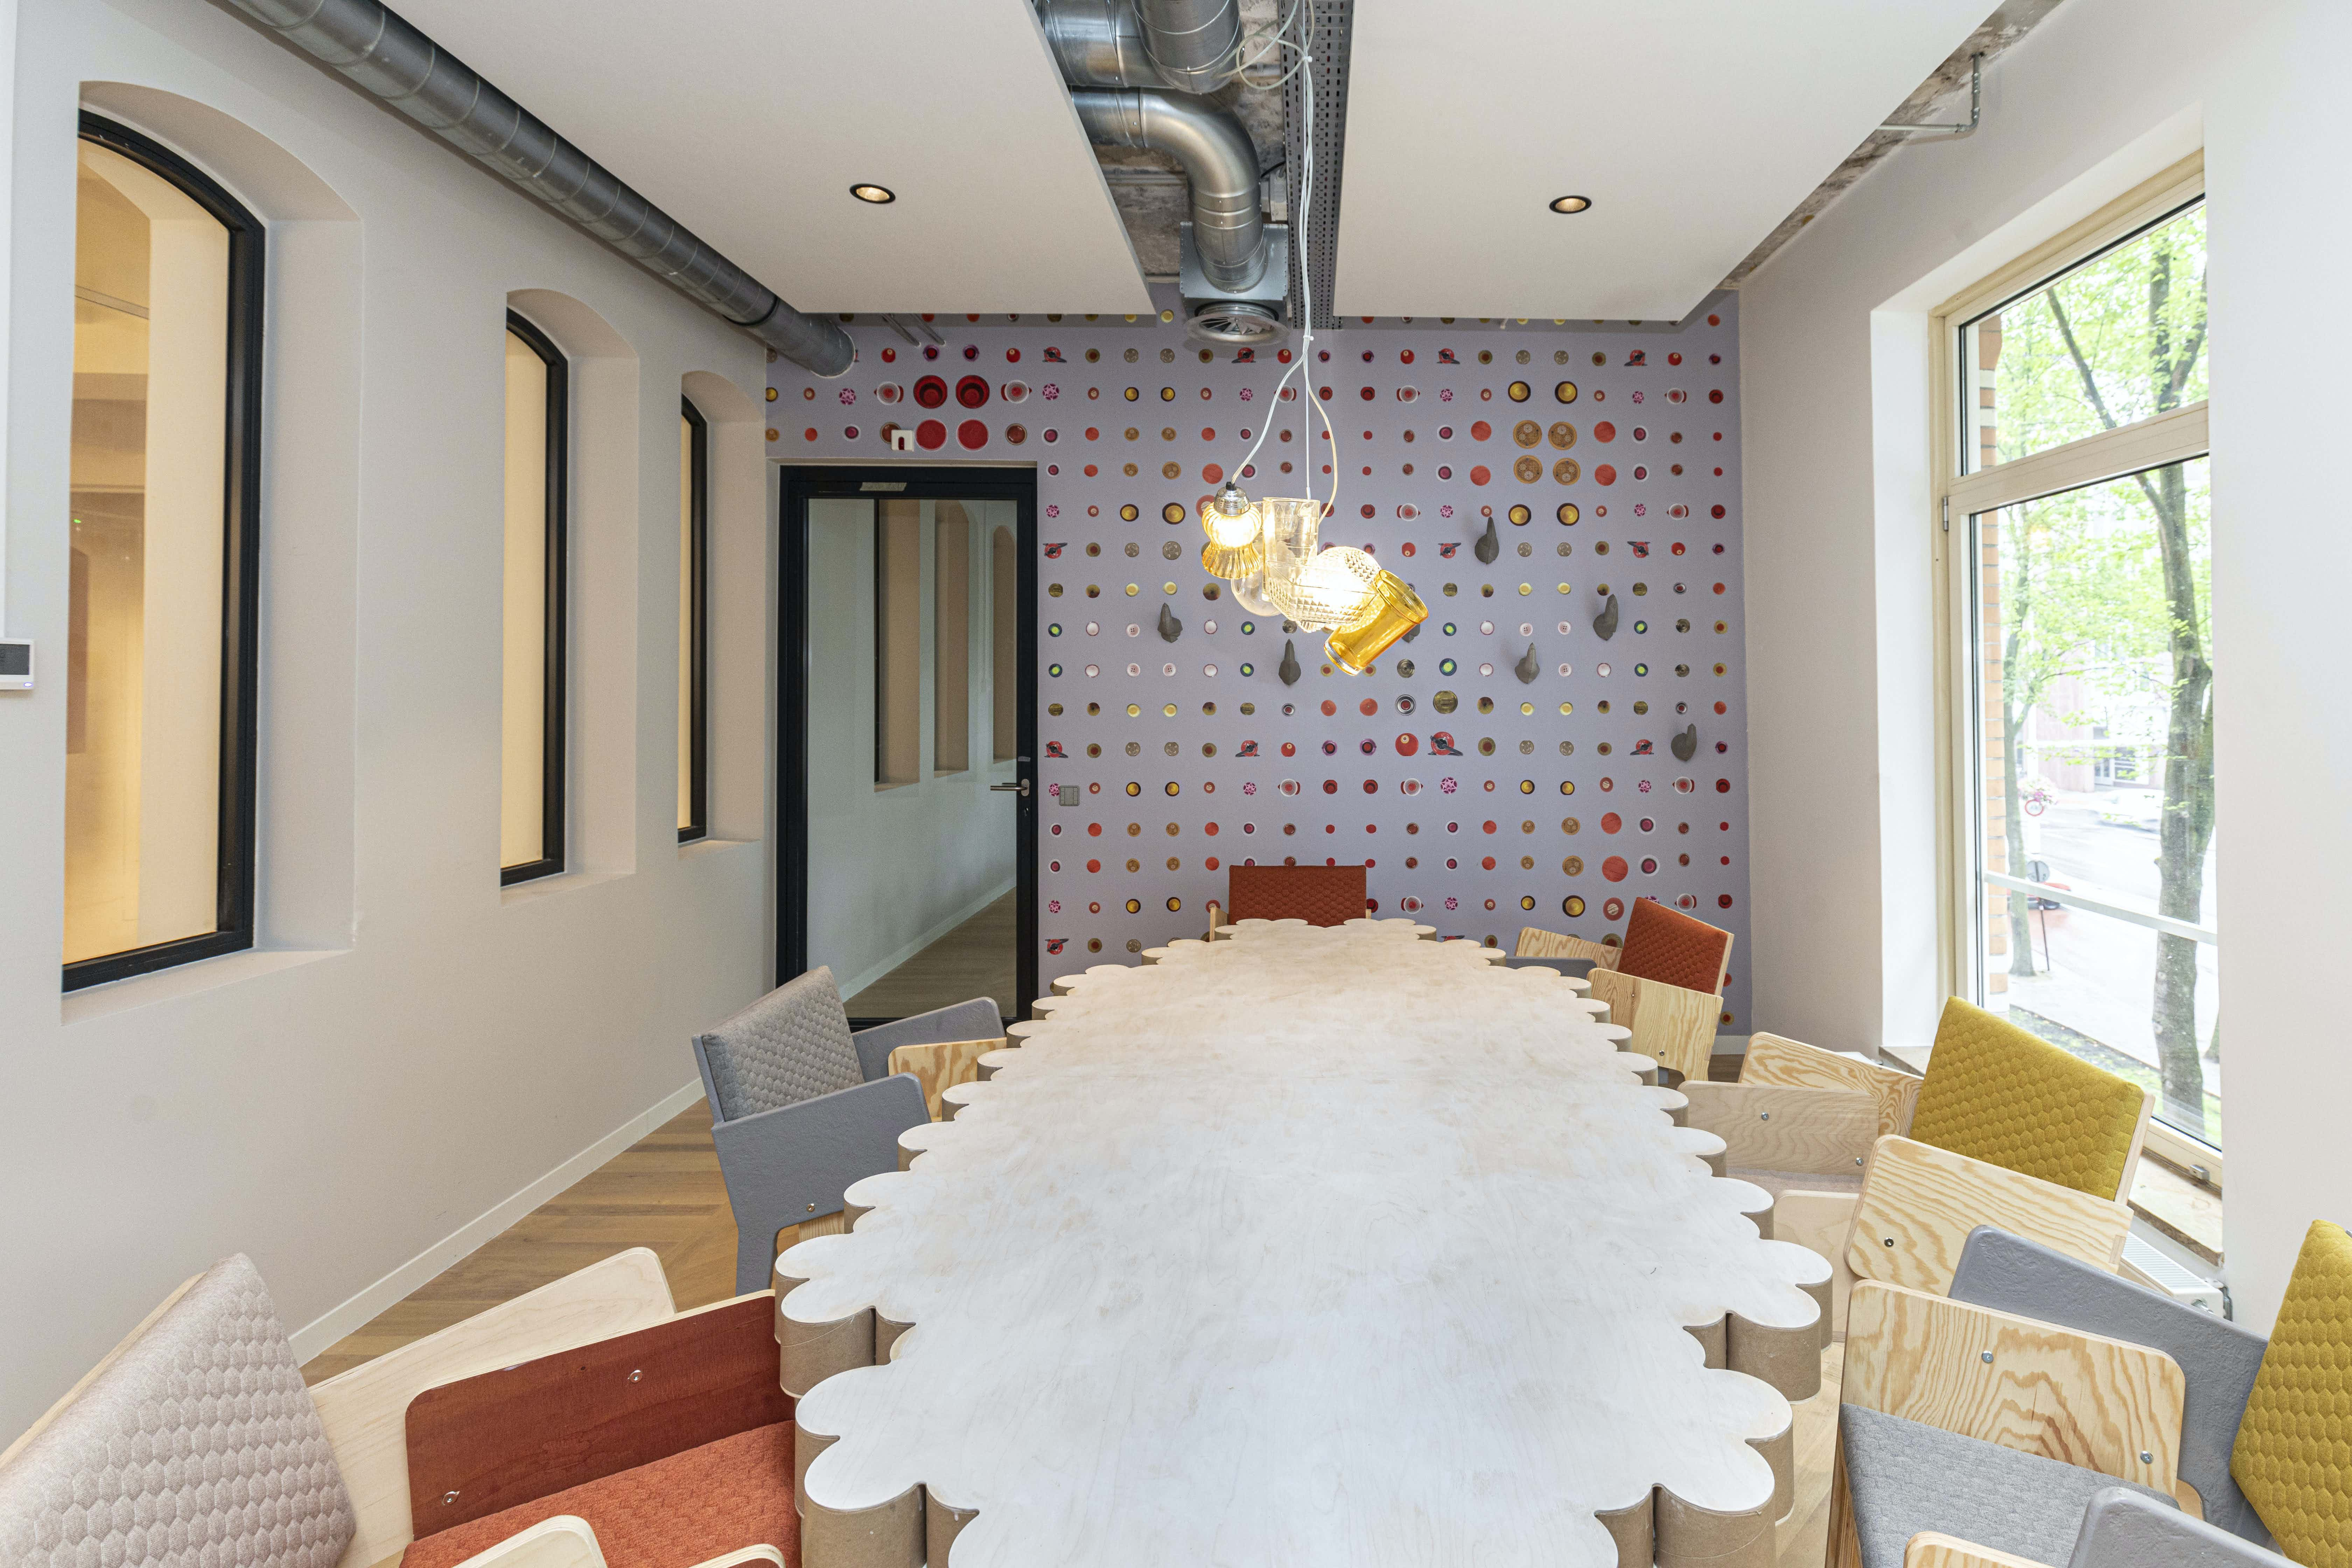 The Round Room, Capital C Amsterdam